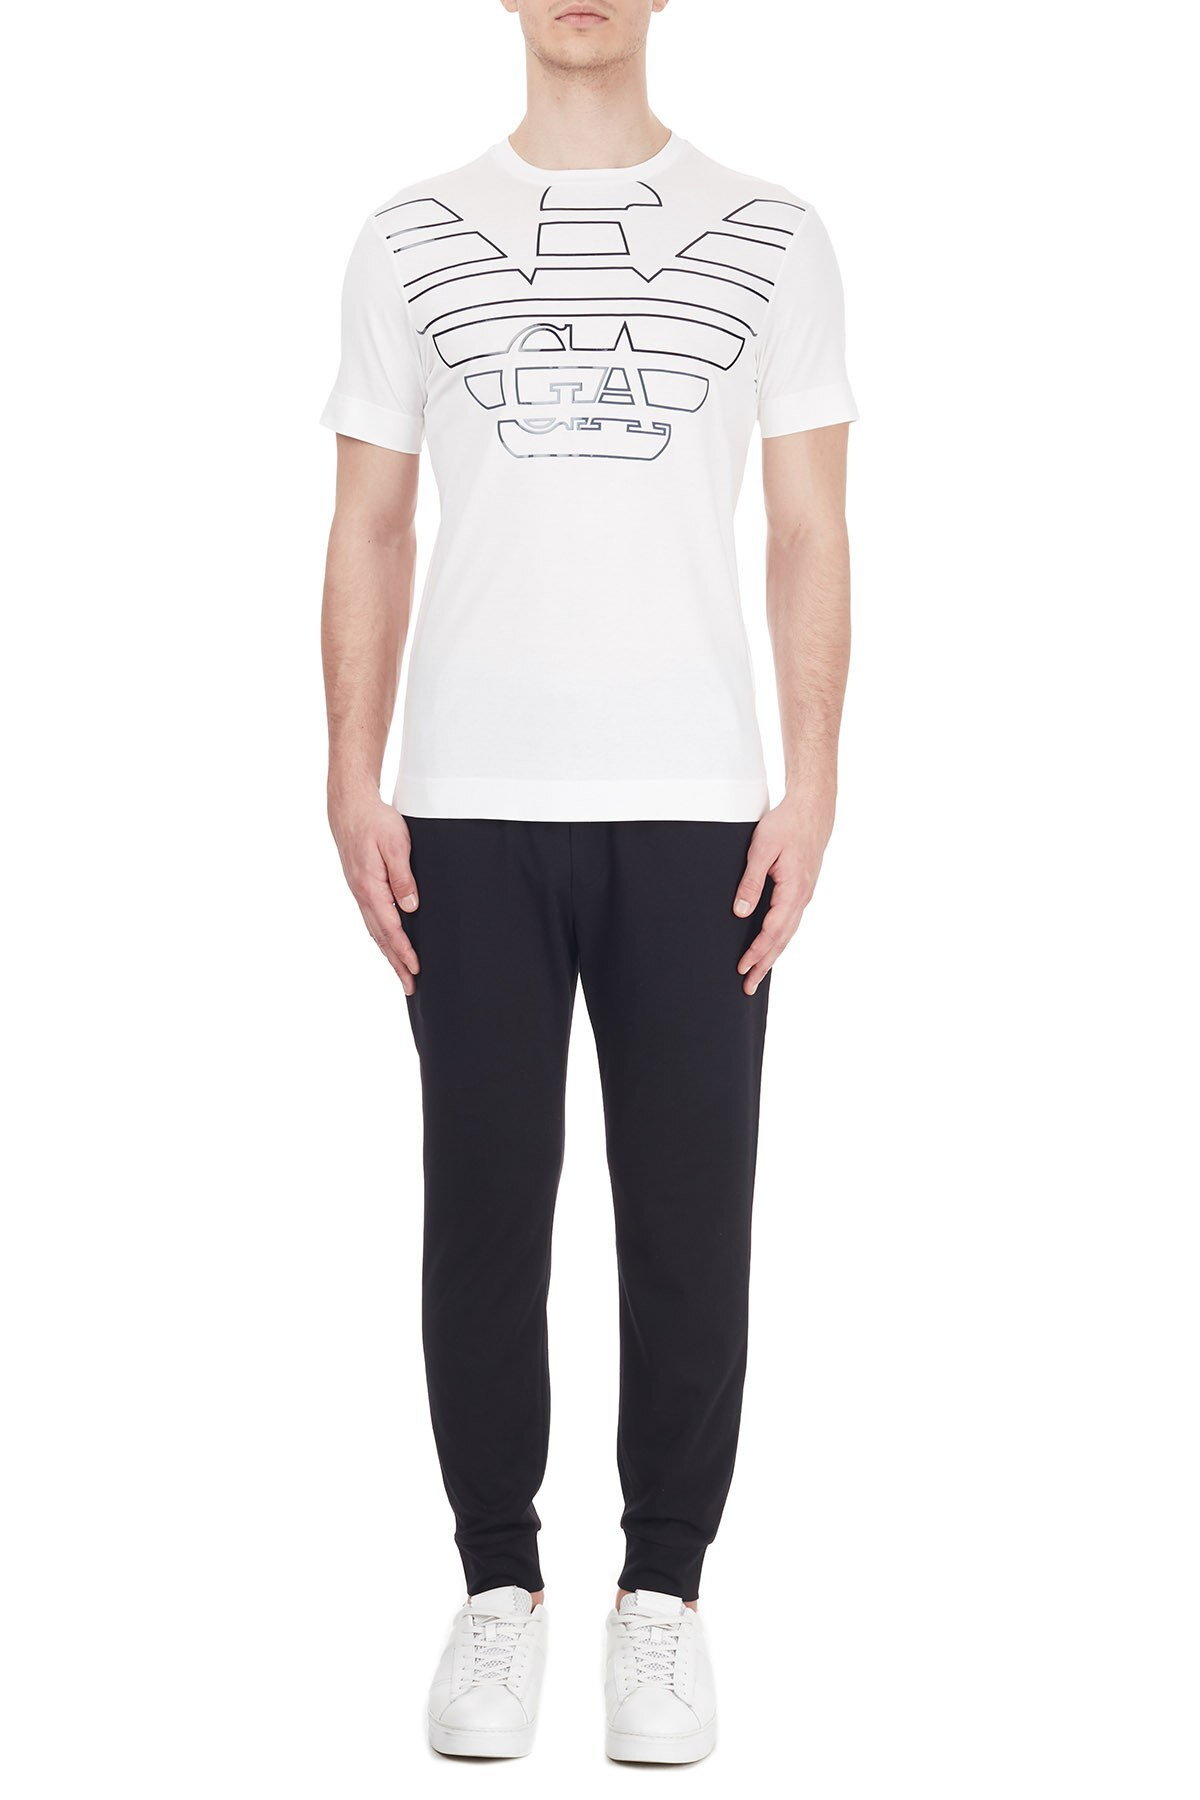 Emporio Armani Logo Baskılı Bisiklet Yaka % 100 Pamuk Erkek T Shirt 6H1TQ7 1J30Z 0101 BEYAZ